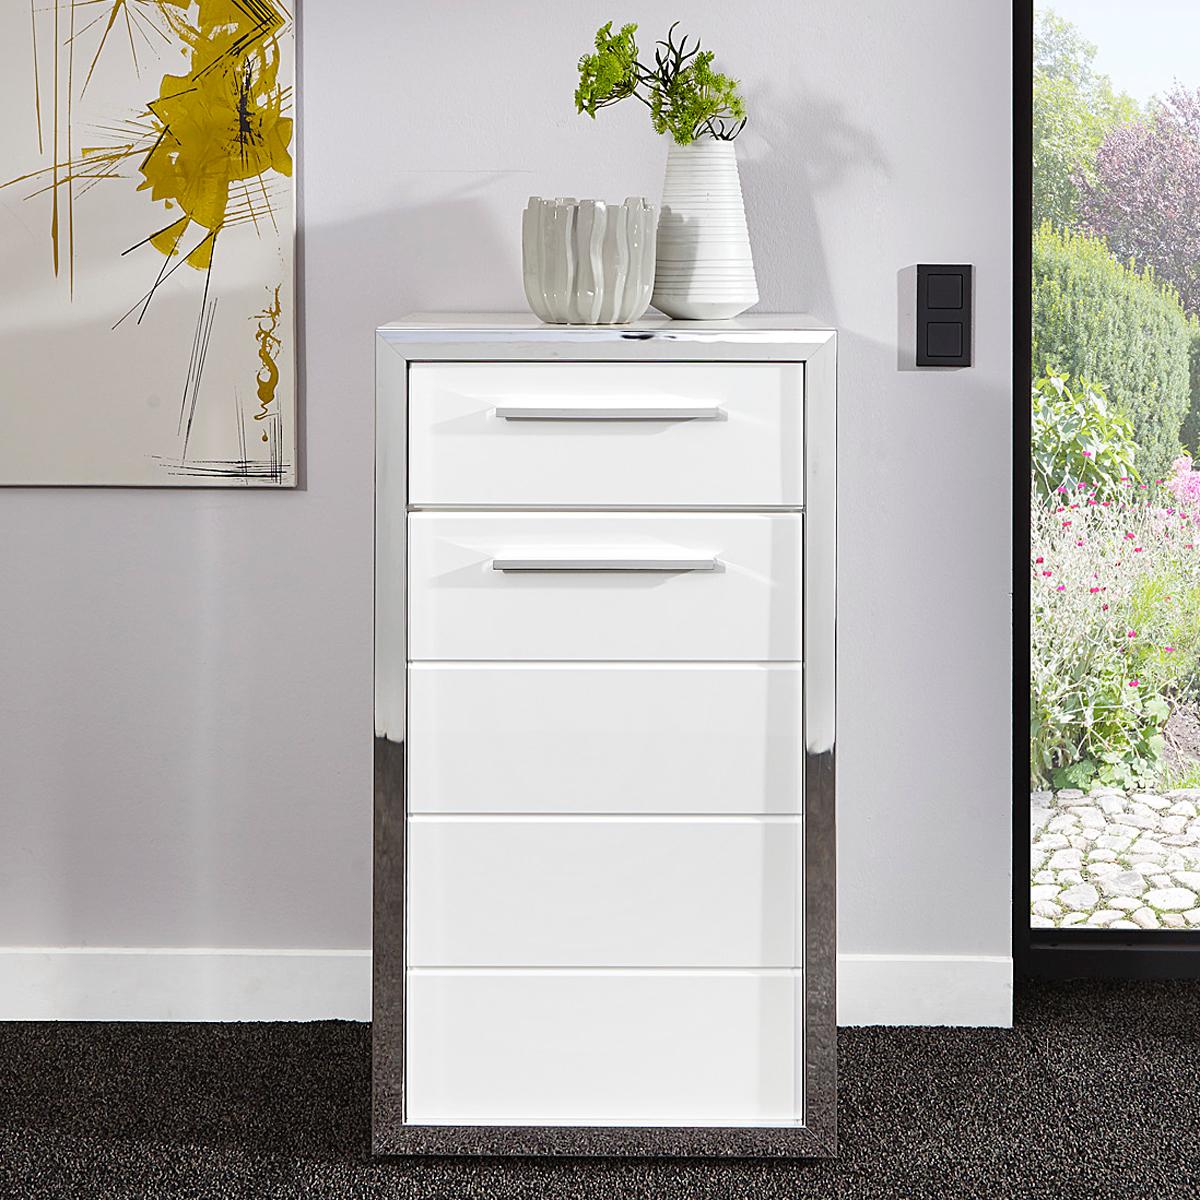 kommode ego 1 t rig schrank wei hochglanz rahmen chromgl nzend ebay. Black Bedroom Furniture Sets. Home Design Ideas